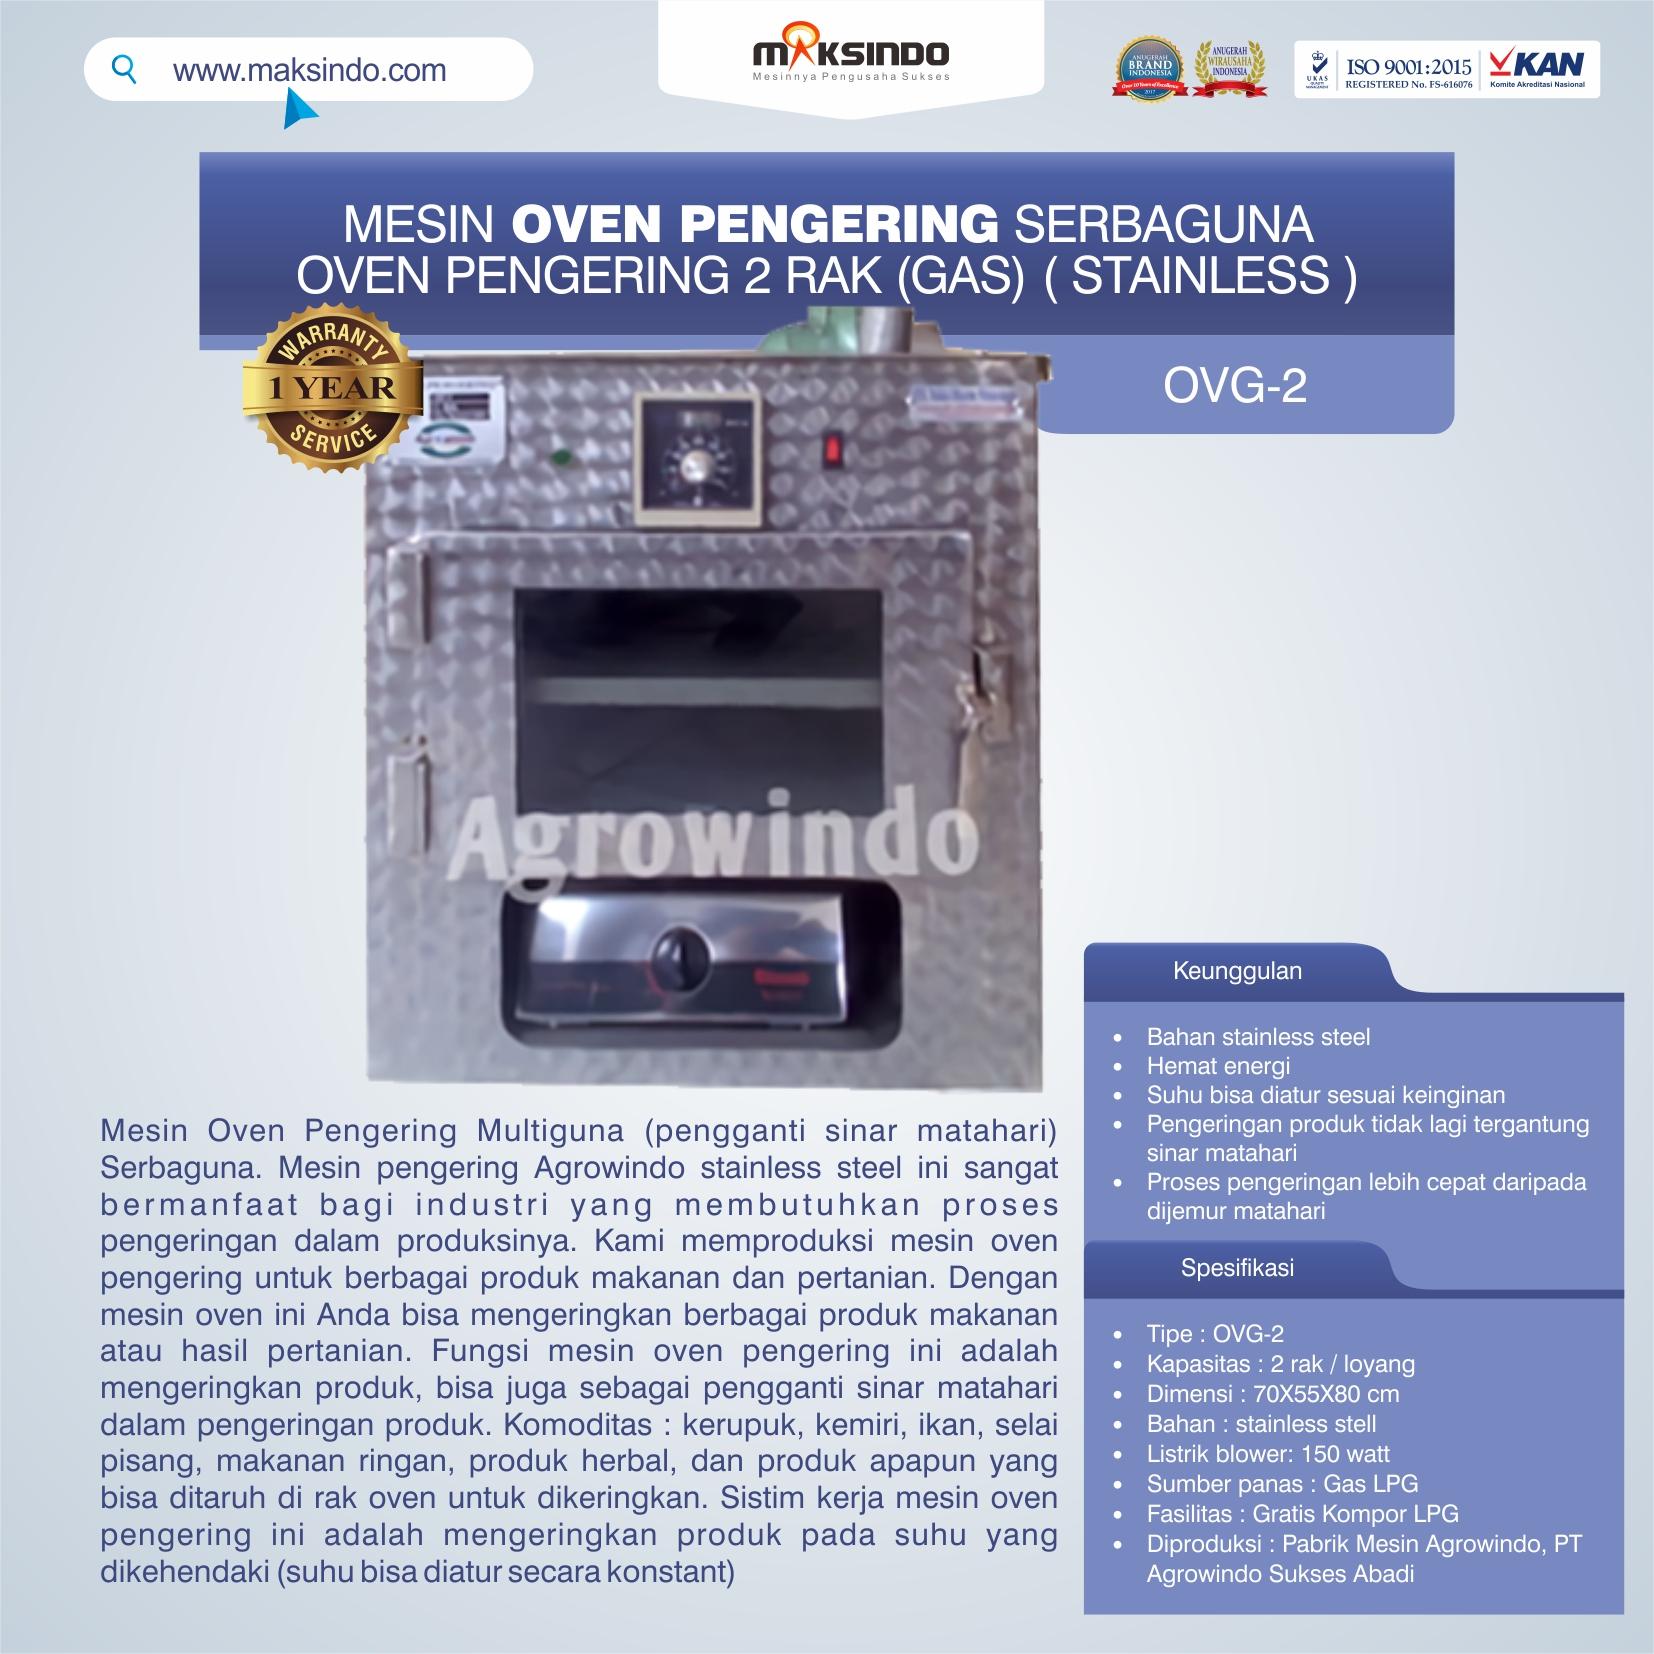 OVG-2 Mesin Oven Pengering Serbaguna 2 Rak (Gas) (Stainless )